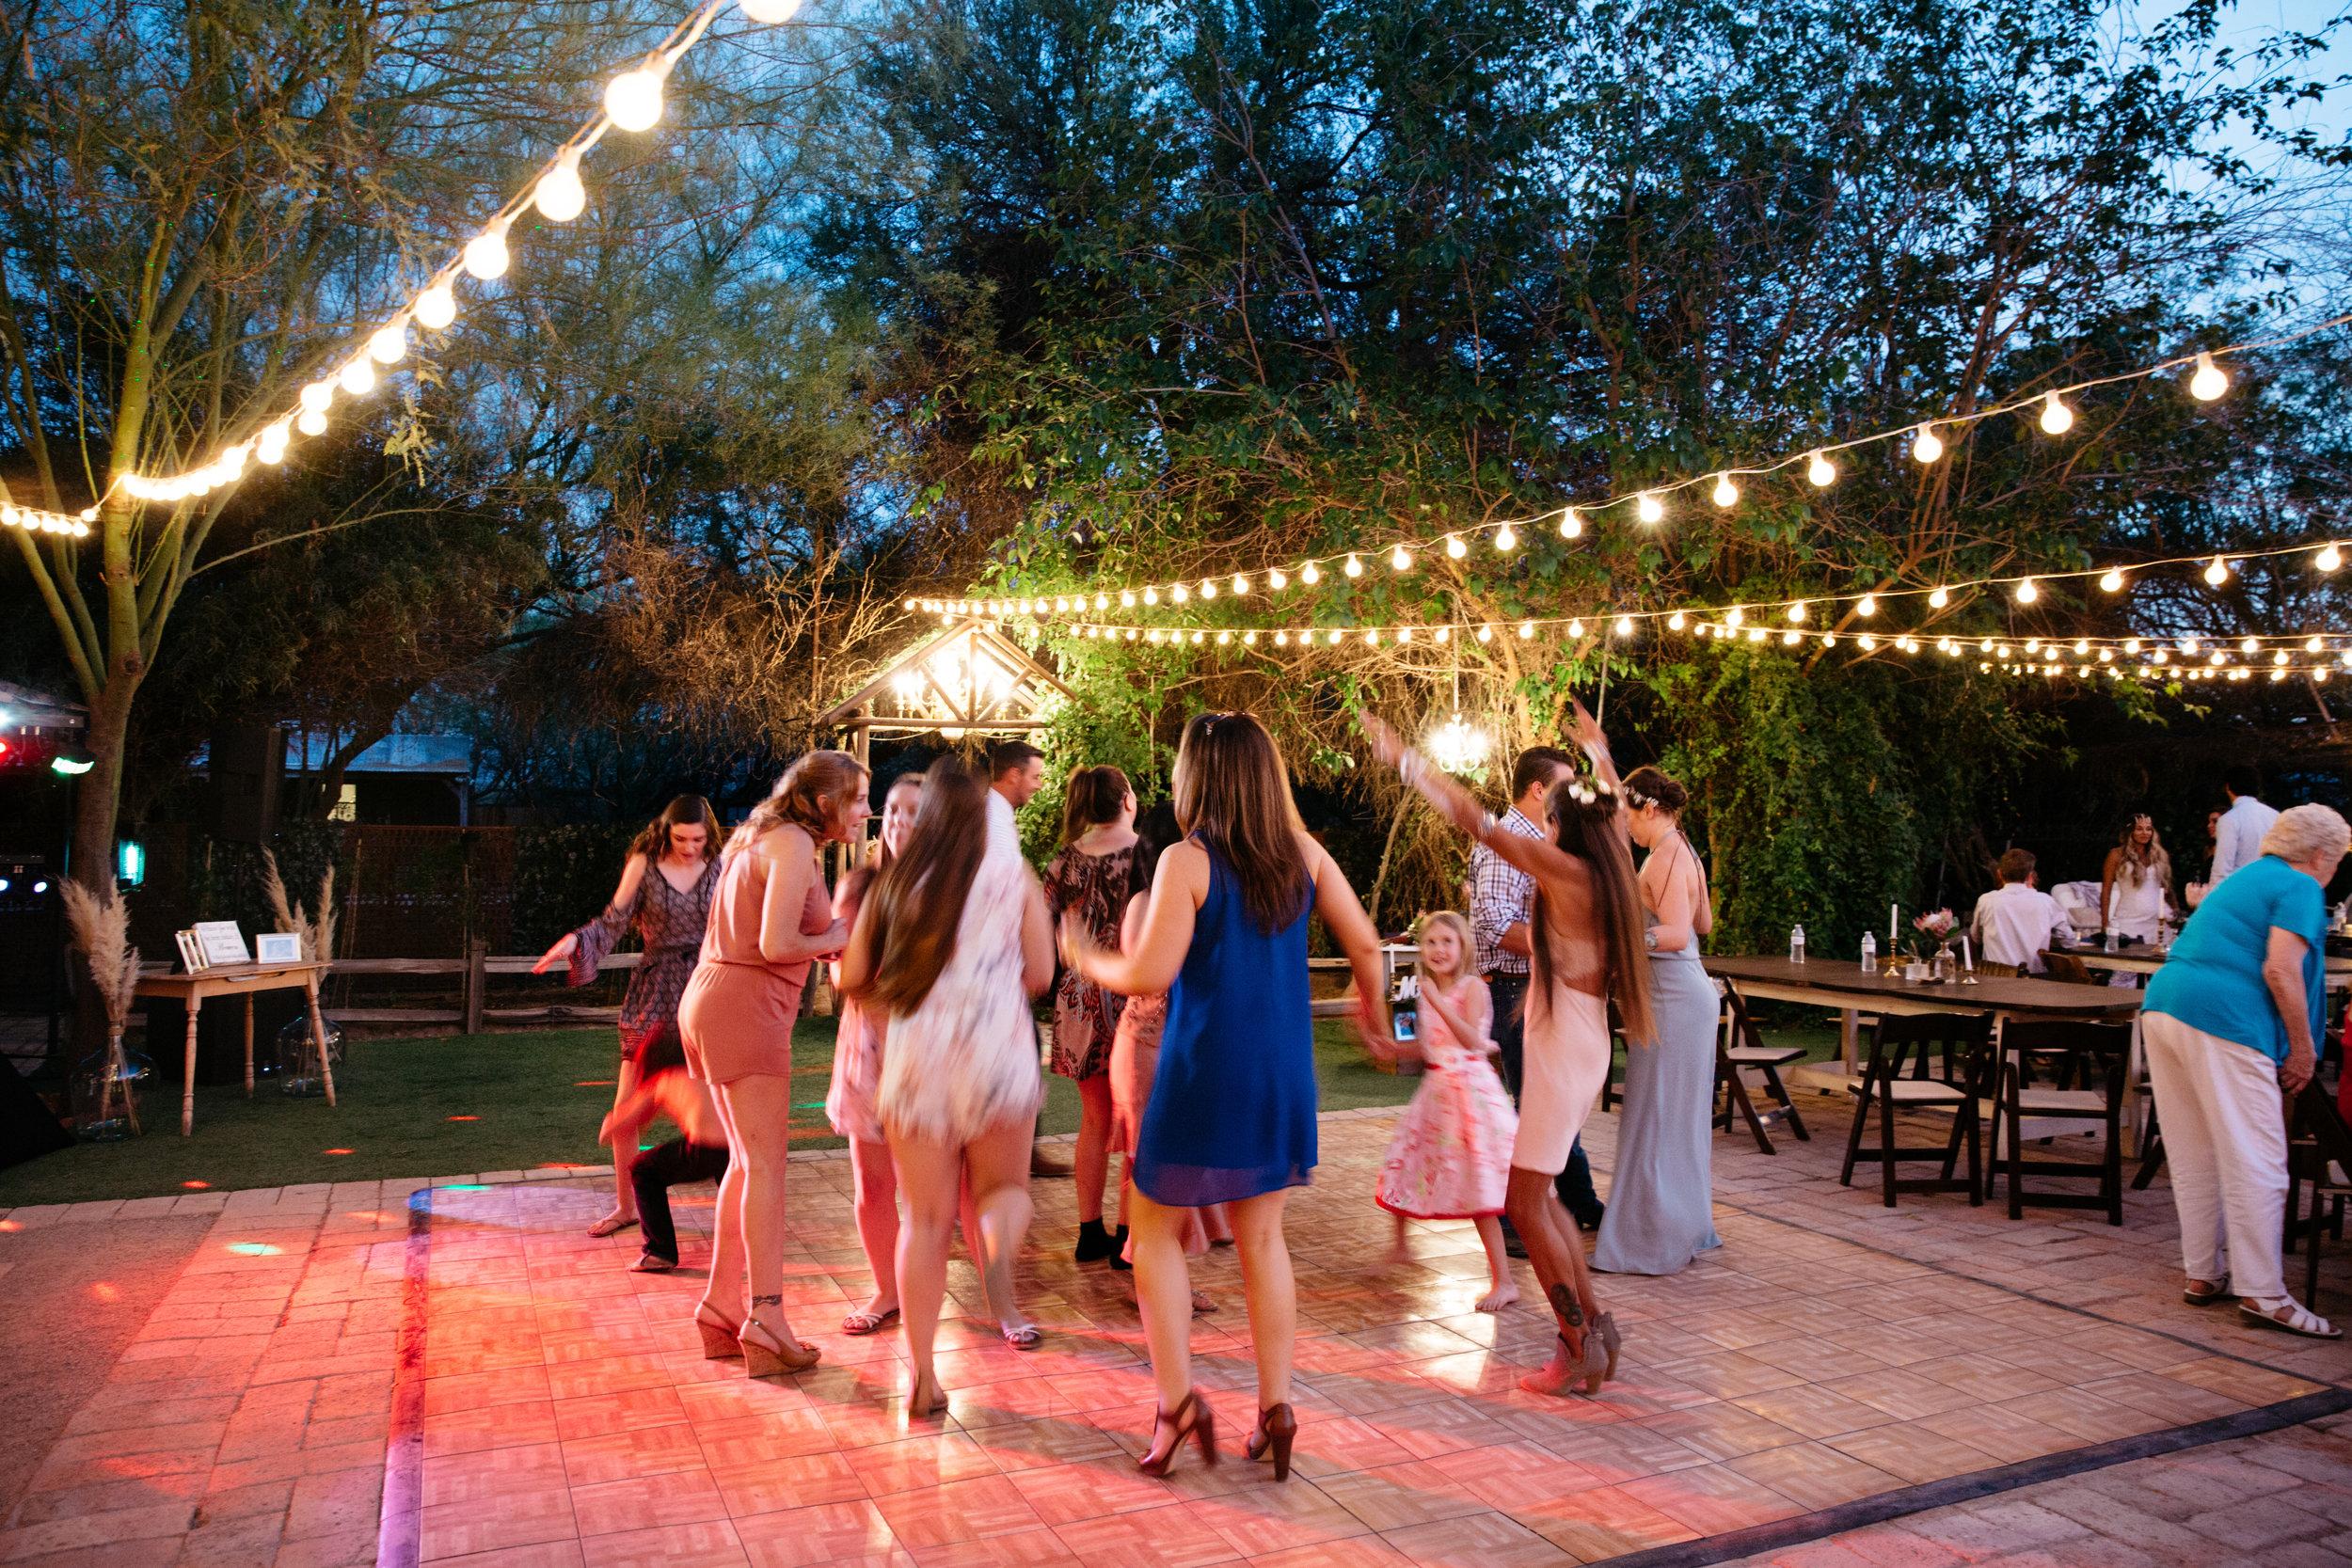 colorado-springs-wedding-photographer-46.jpg